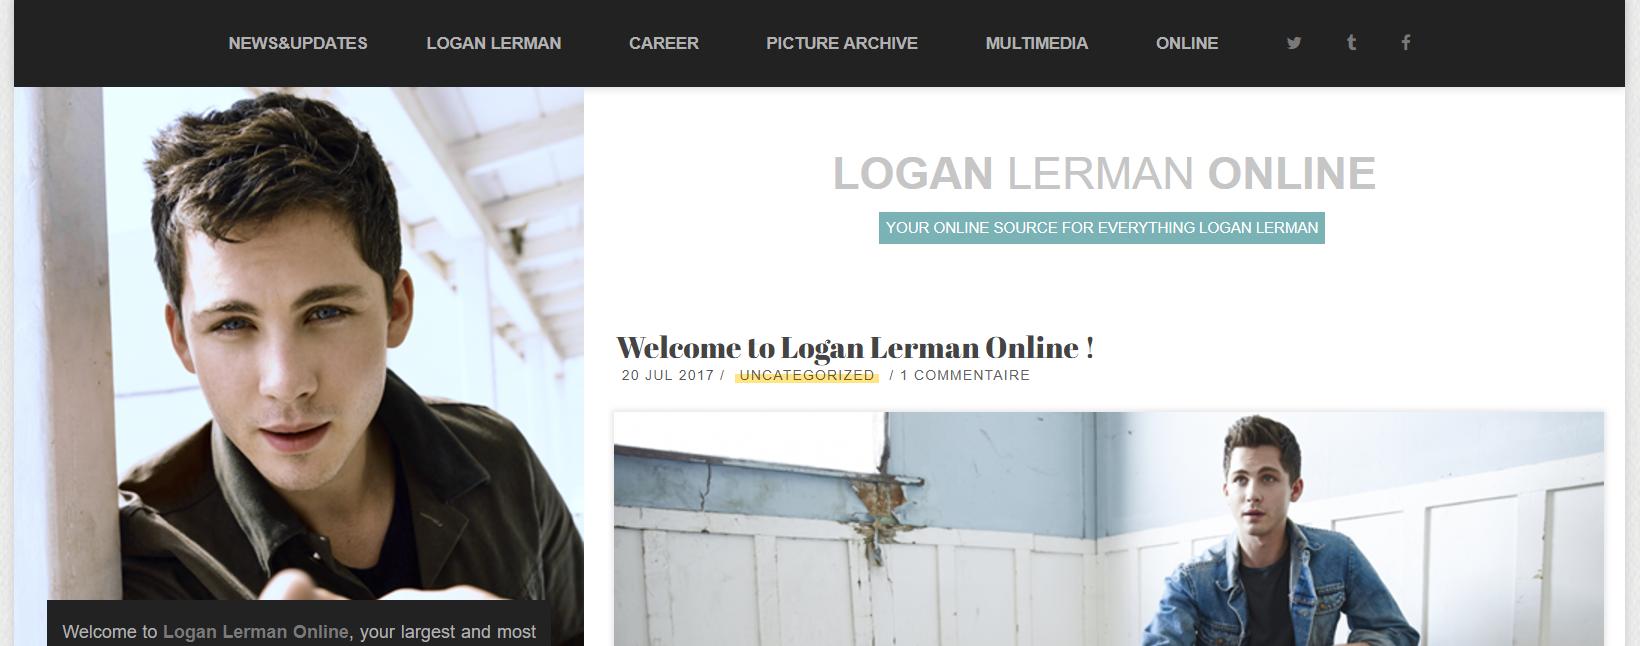 http://loganlerman.us/